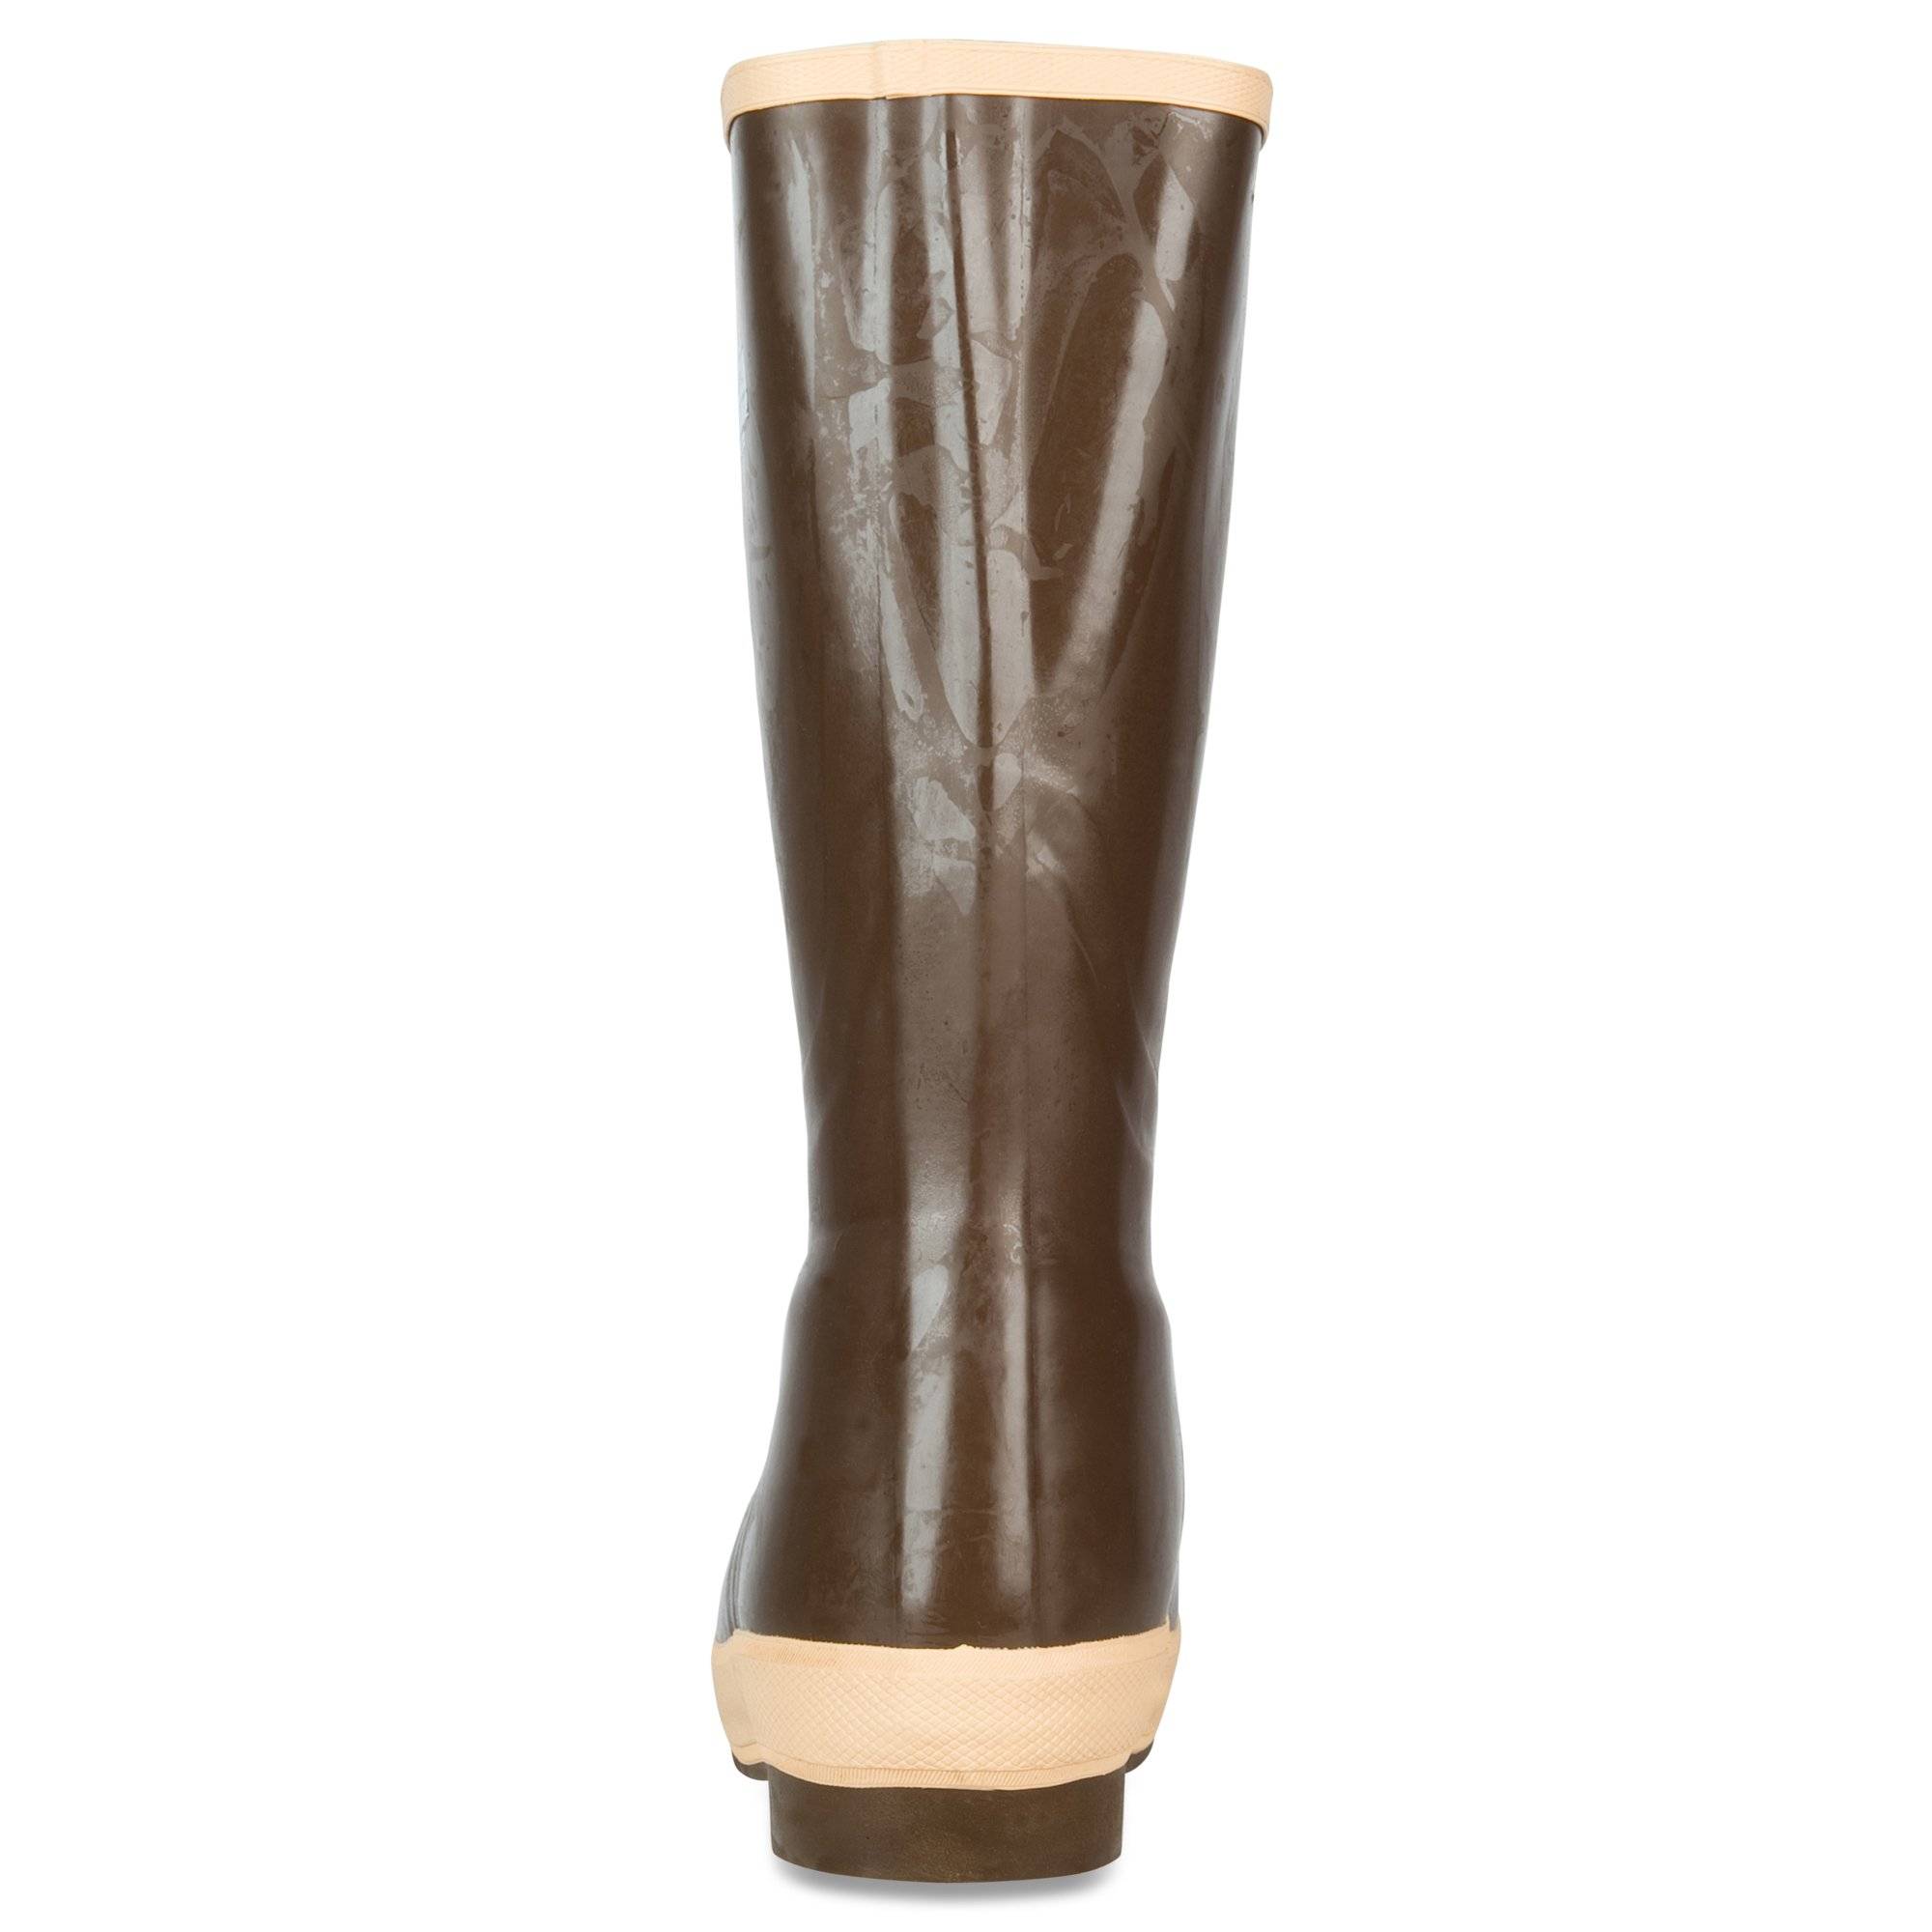 XTRATUF Legacy Series 15'' Neoprene Steel Toe Insulated Men's Fishing Boots, Copper & Tan (22273G) by Xtratuf (Image #2)